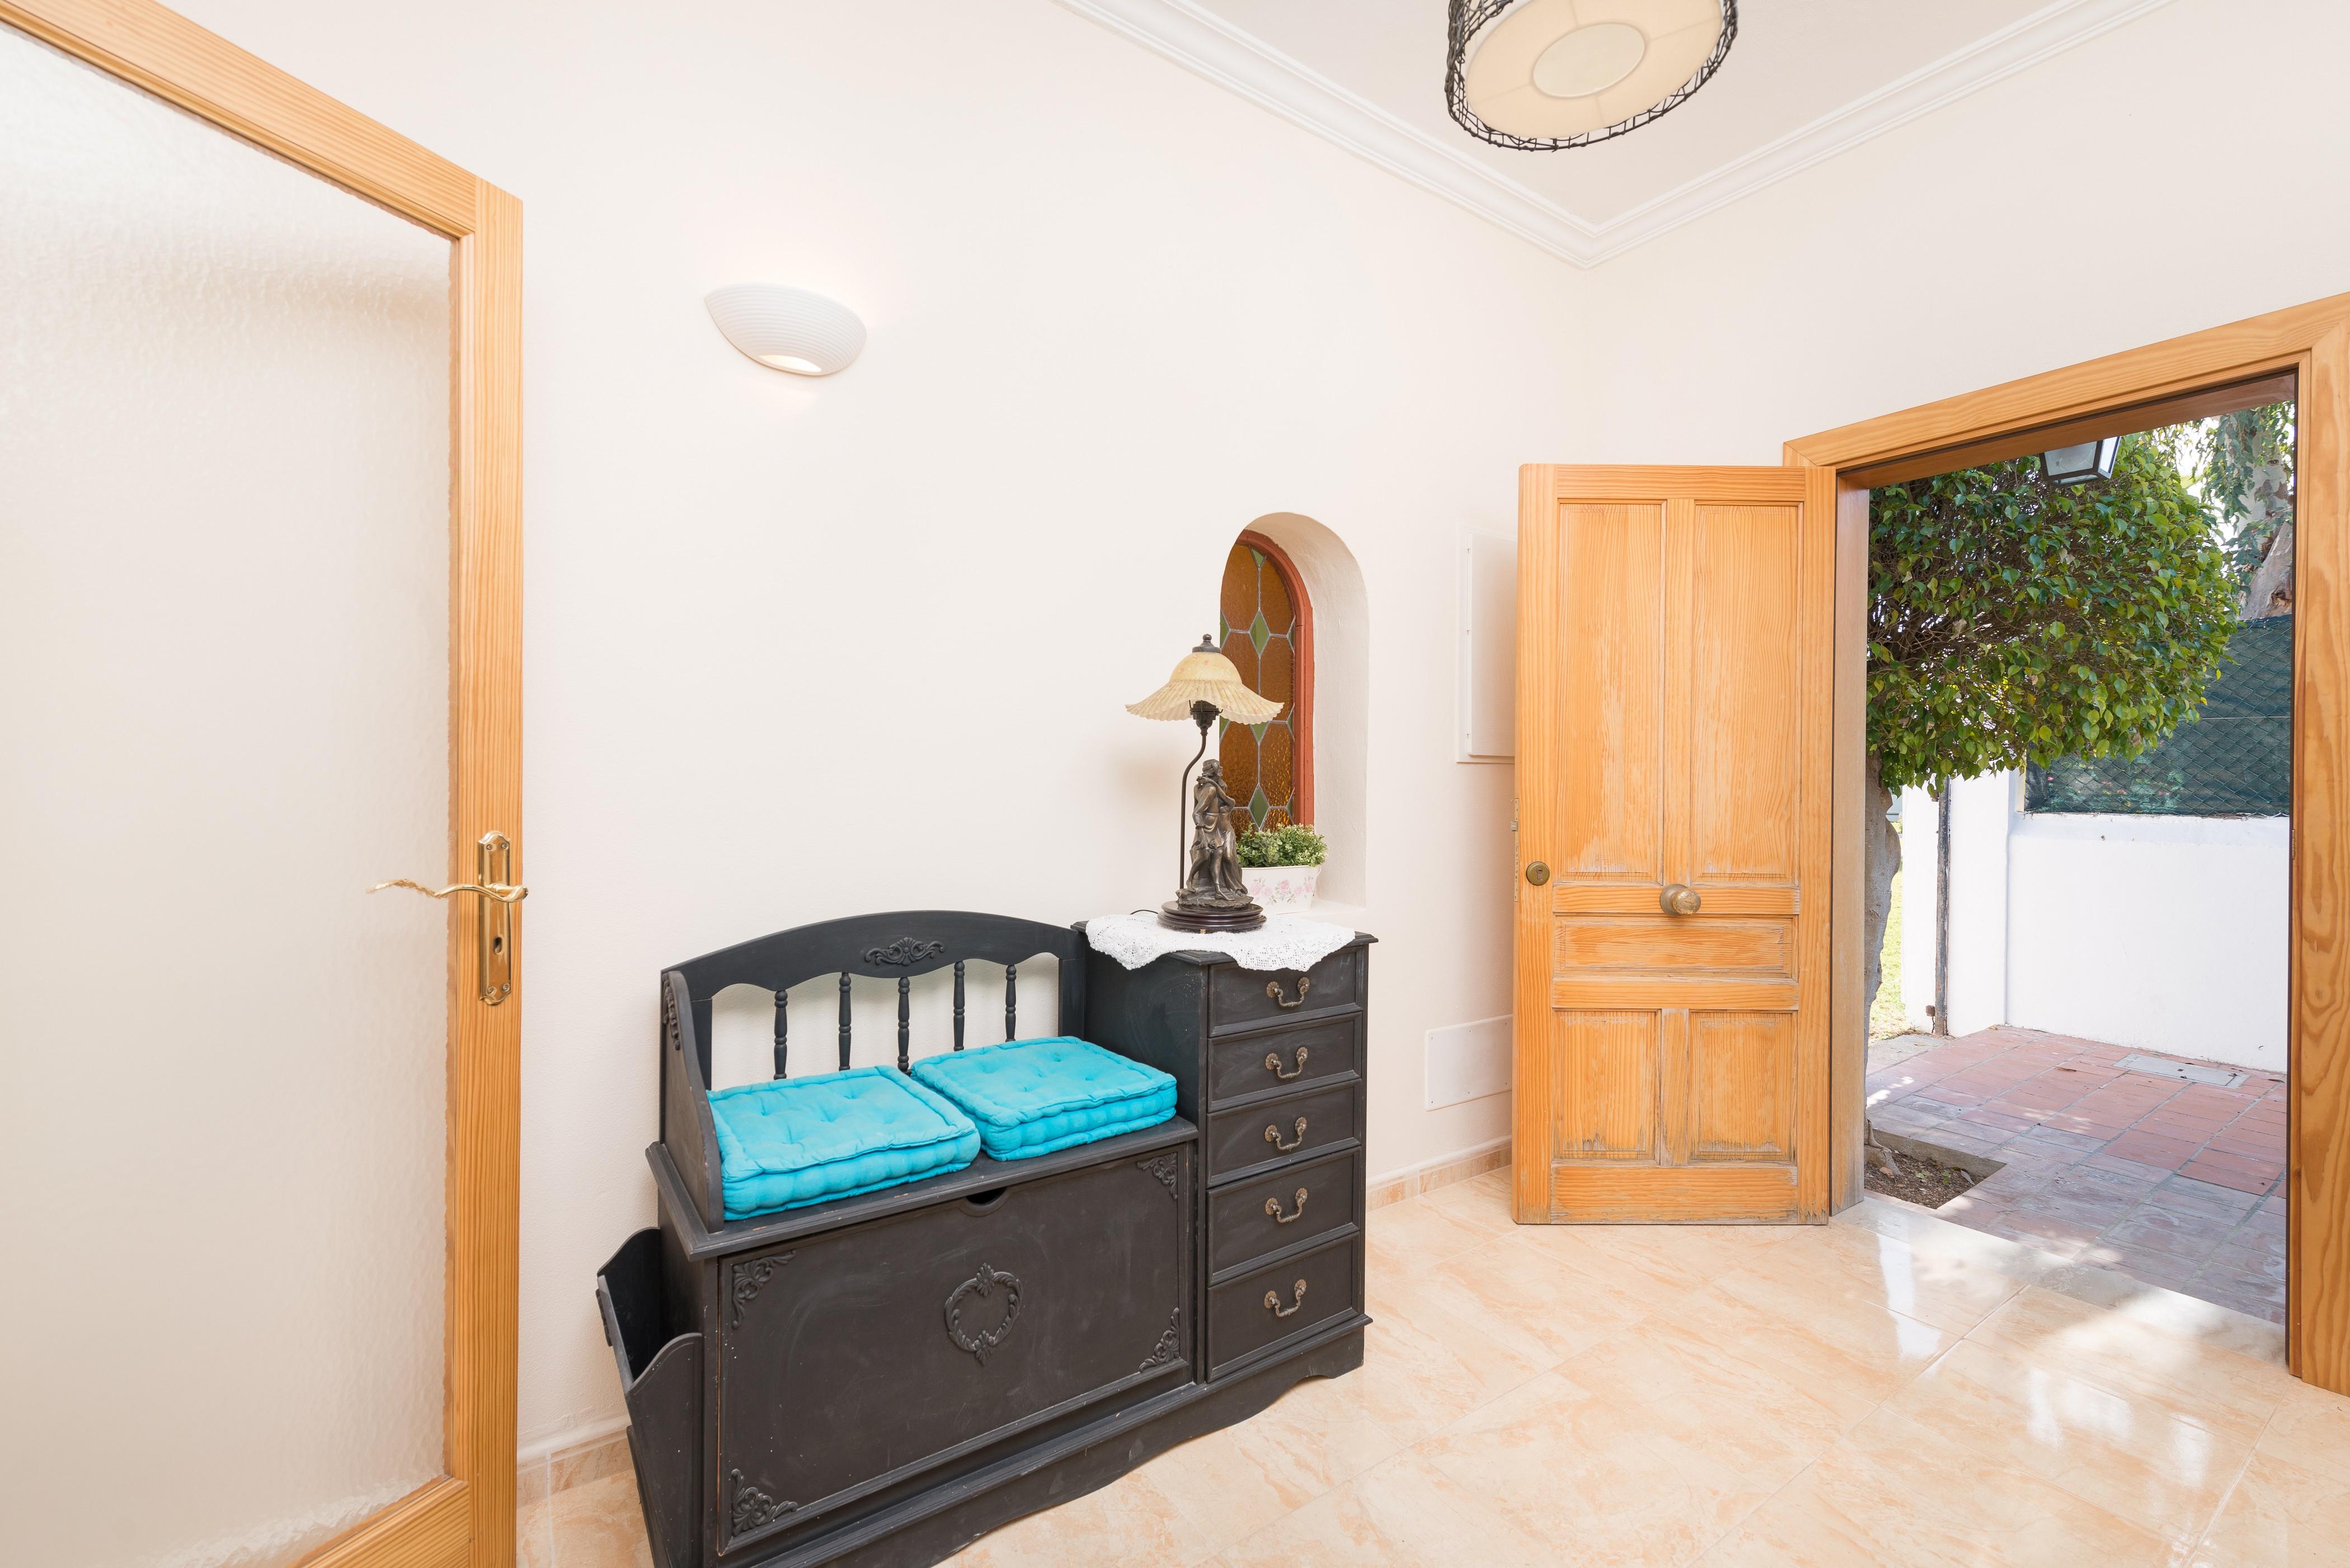 Ferienhaus CAN MOLINA (2063640), Cala Mandia, Mallorca, Balearische Inseln, Spanien, Bild 10